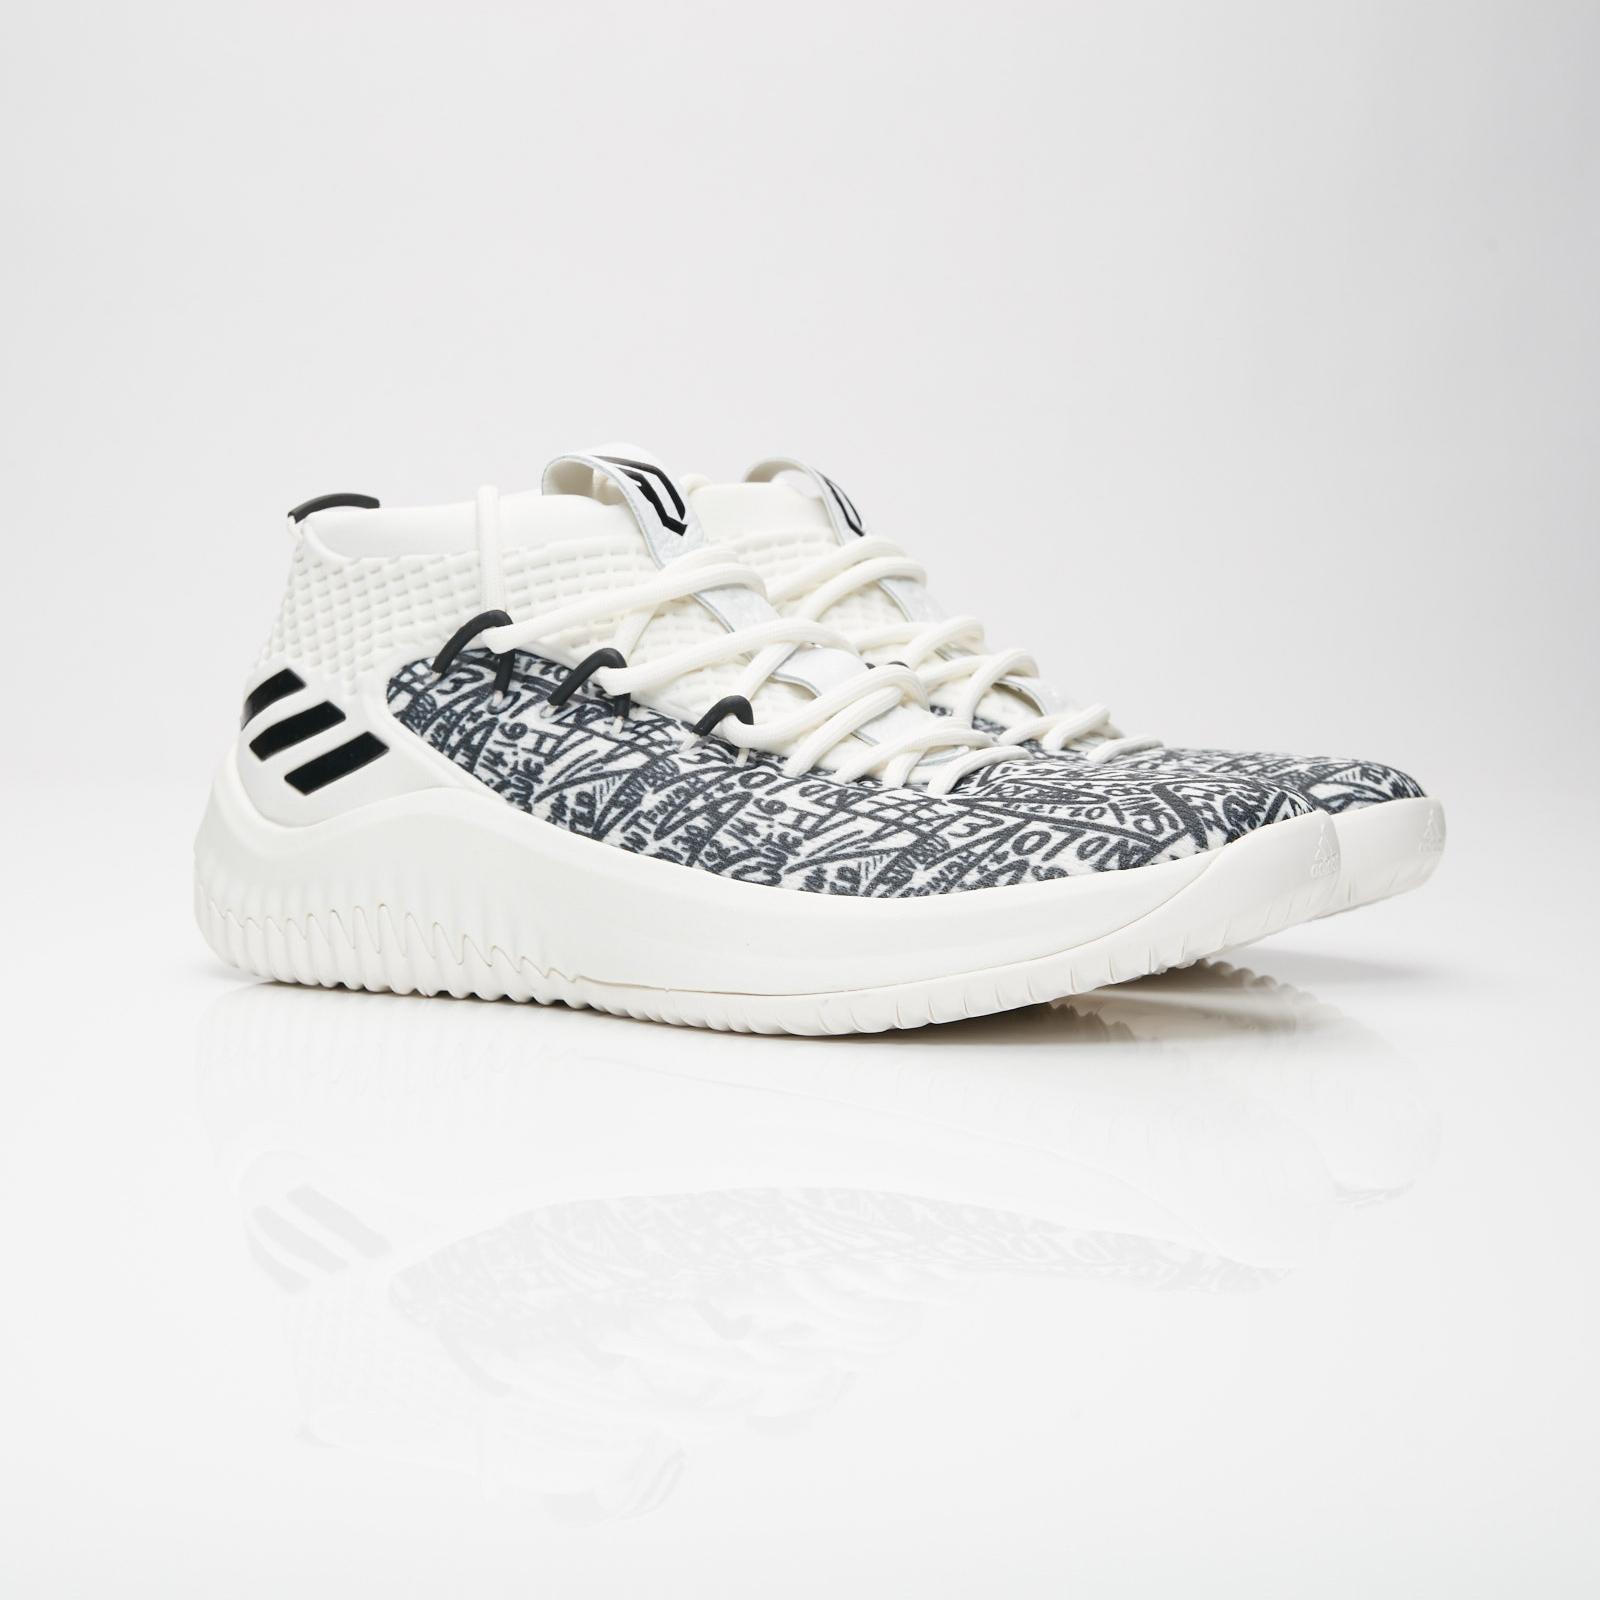 150cb6f76a8d adidas Dame 4 - Aq0597 - Sneakersnstuff